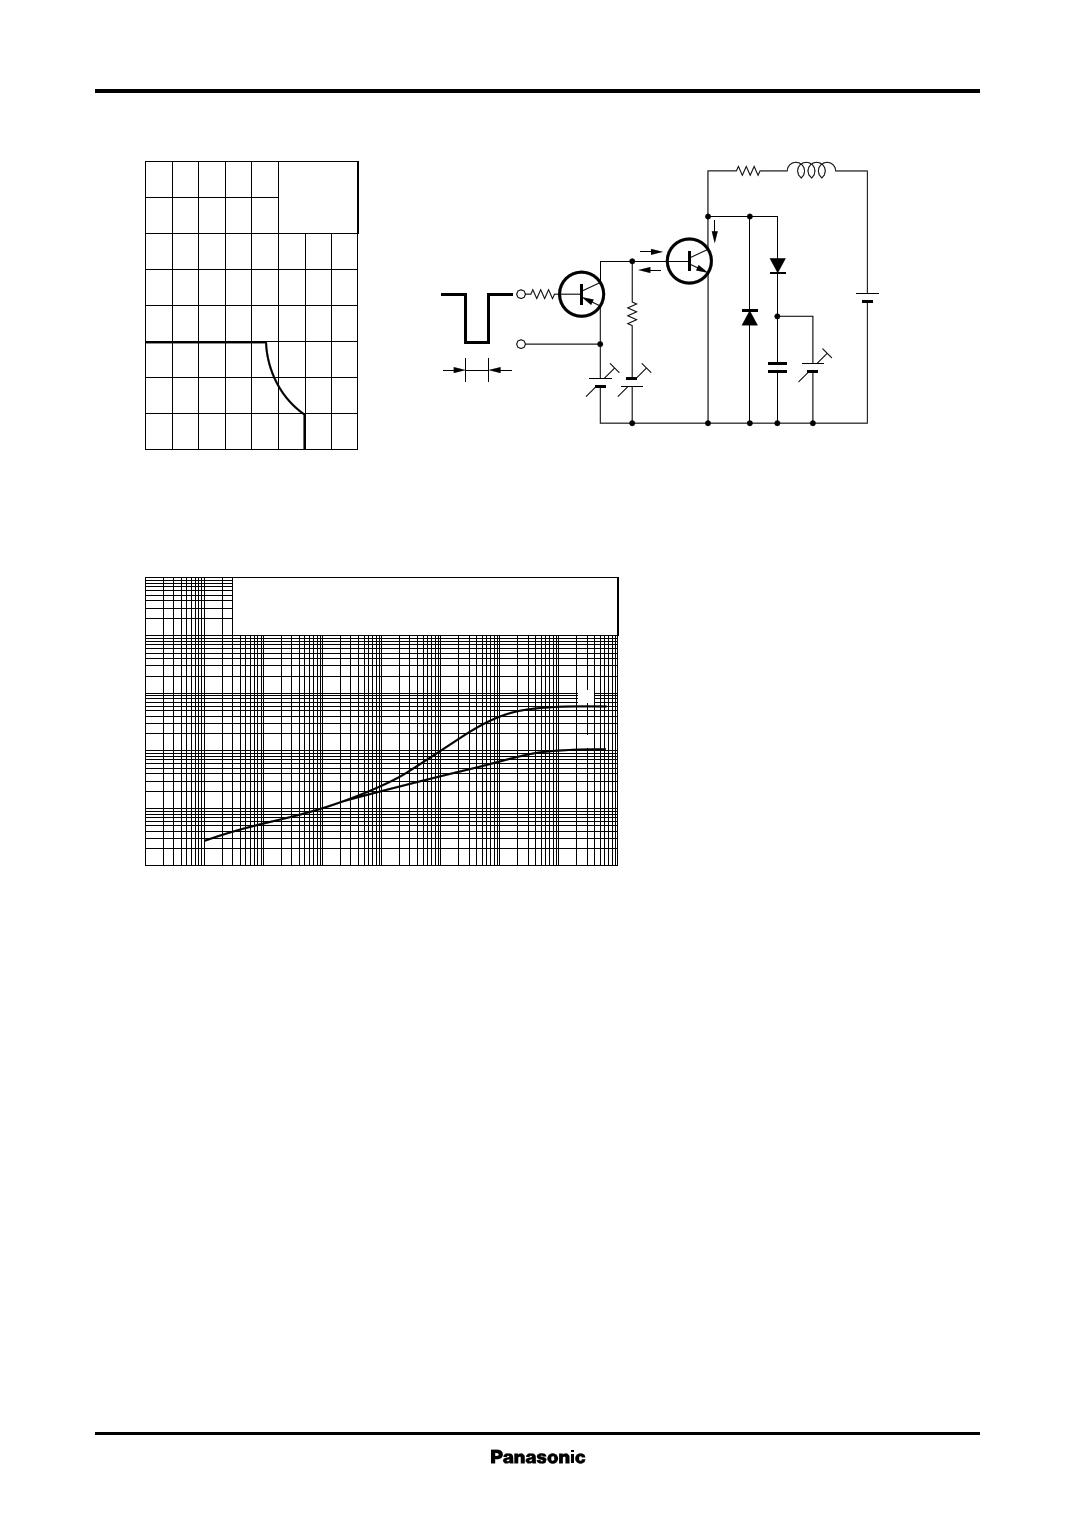 C5127A pdf, ピン配列